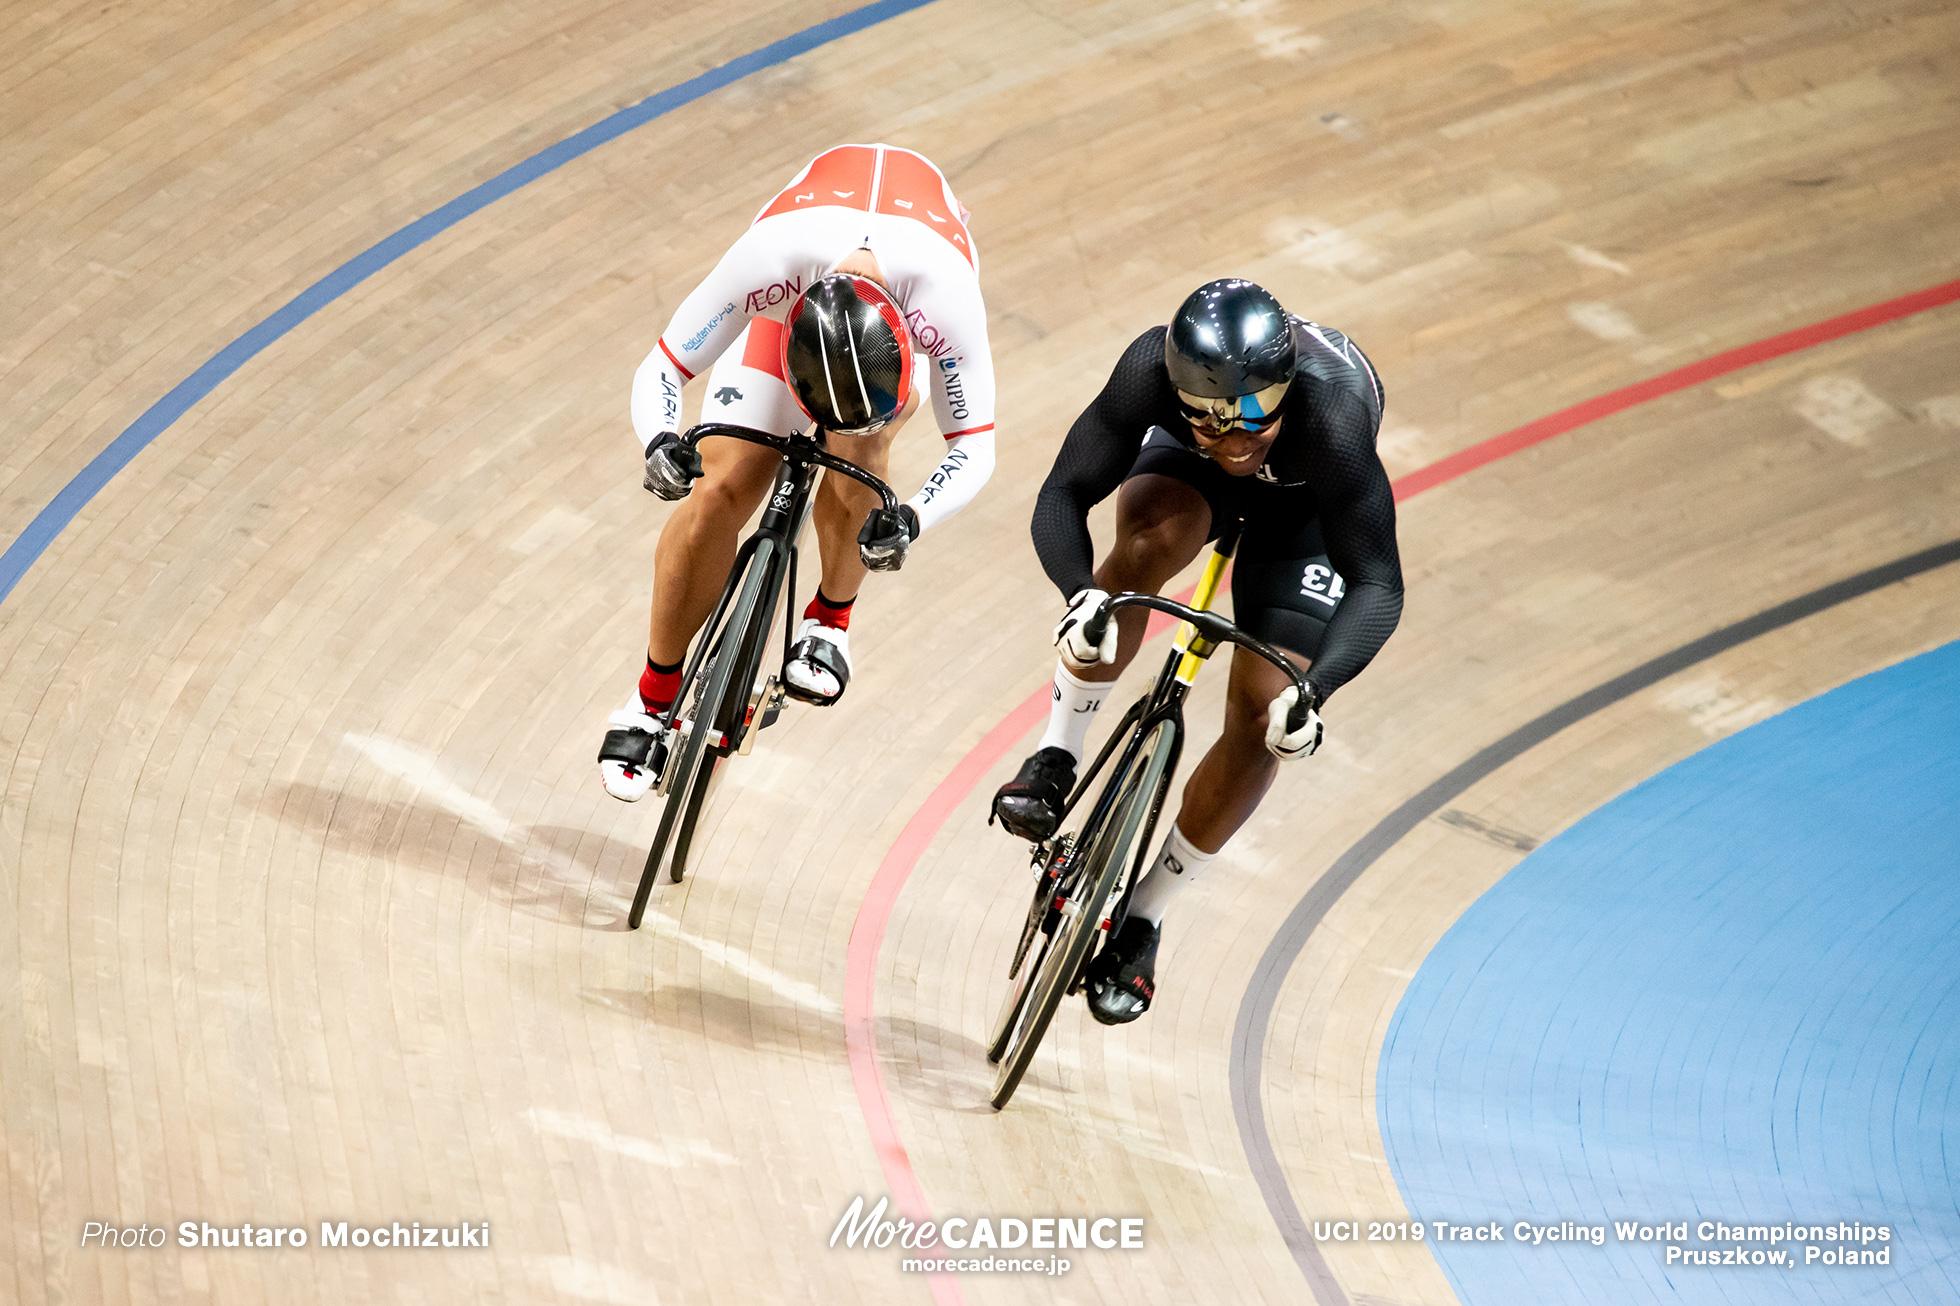 Men's Sprint 1/16 Final / 2019 Track Cycling World Championships Pruszków, Poland